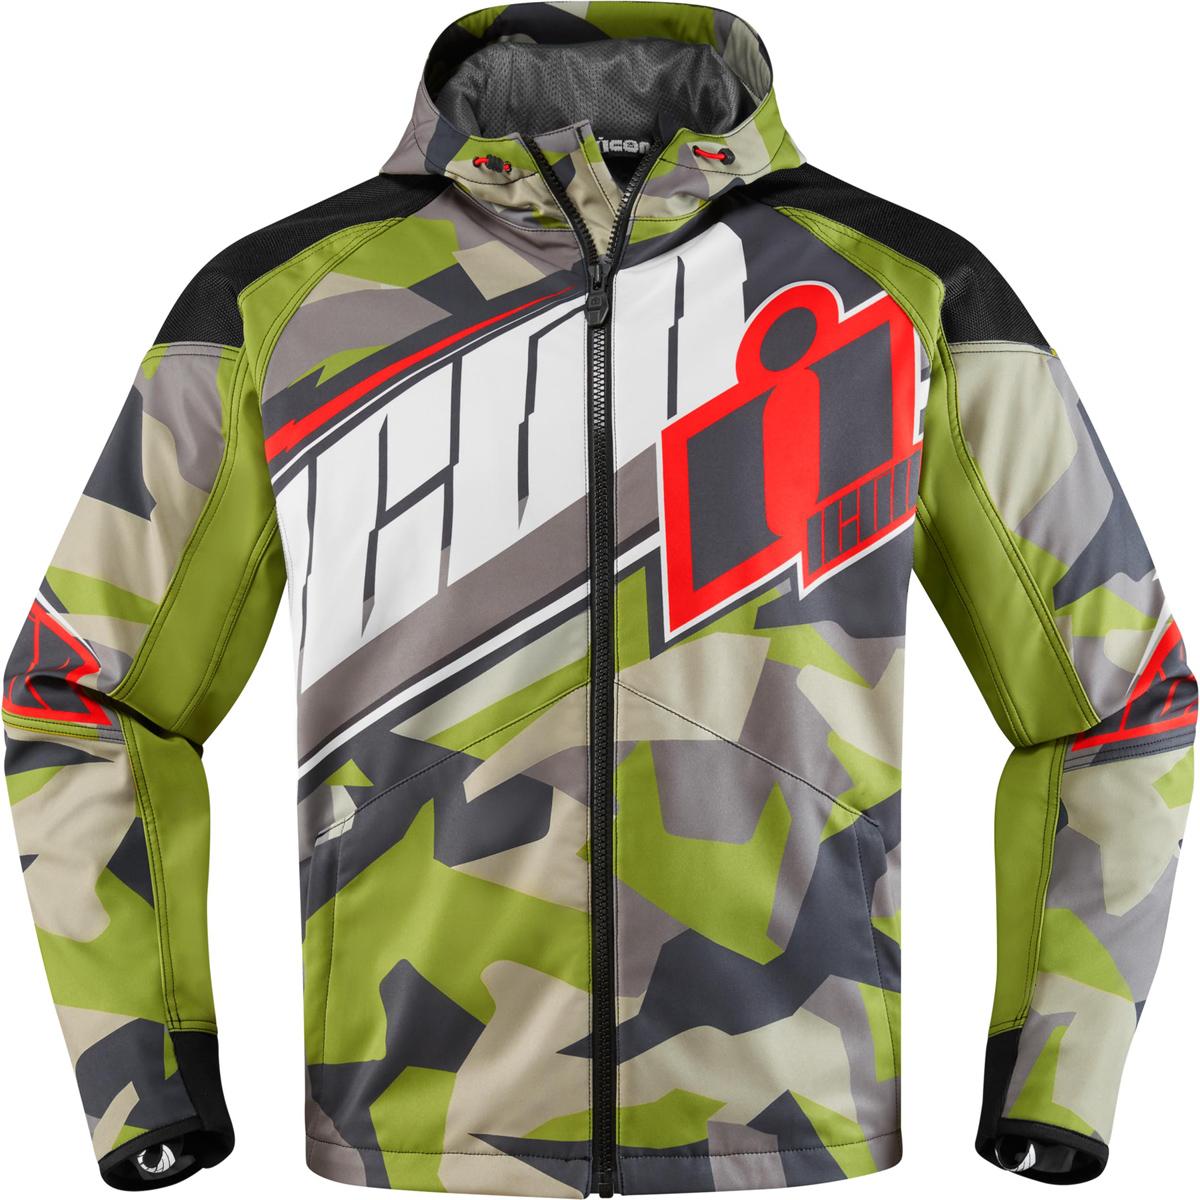 ICON Men's Merc Deployed Green Jacket